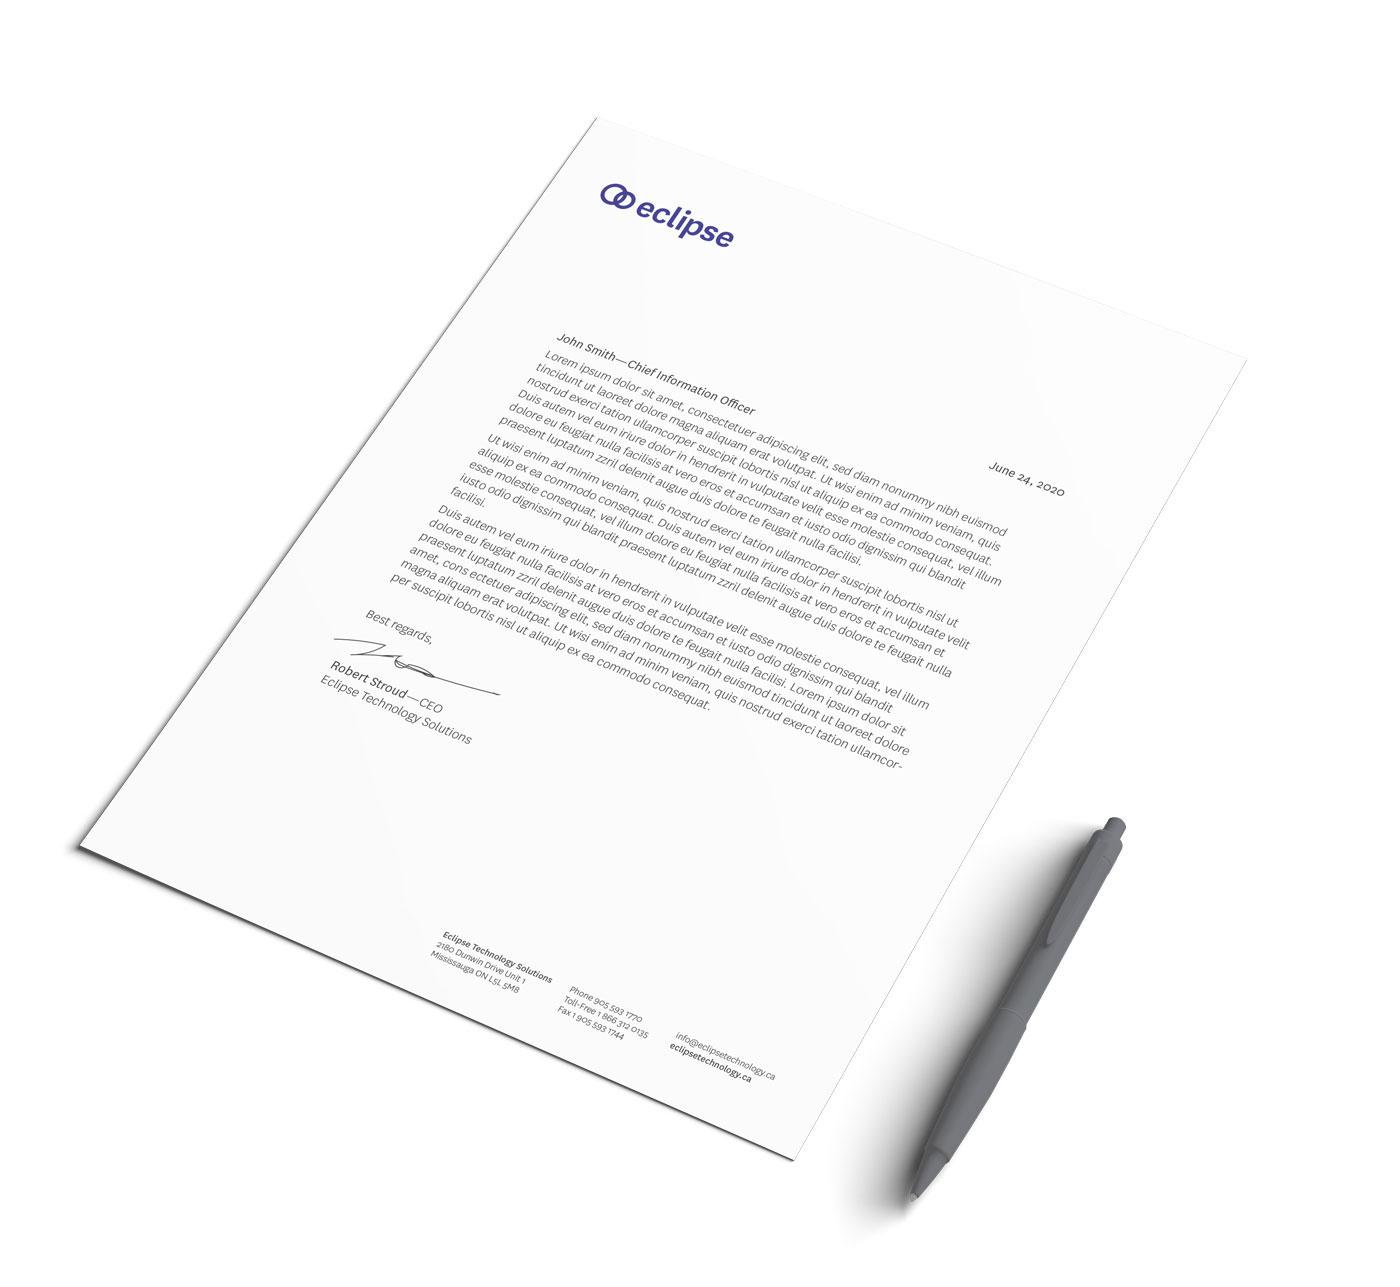 Eclipse Technology letterhead design